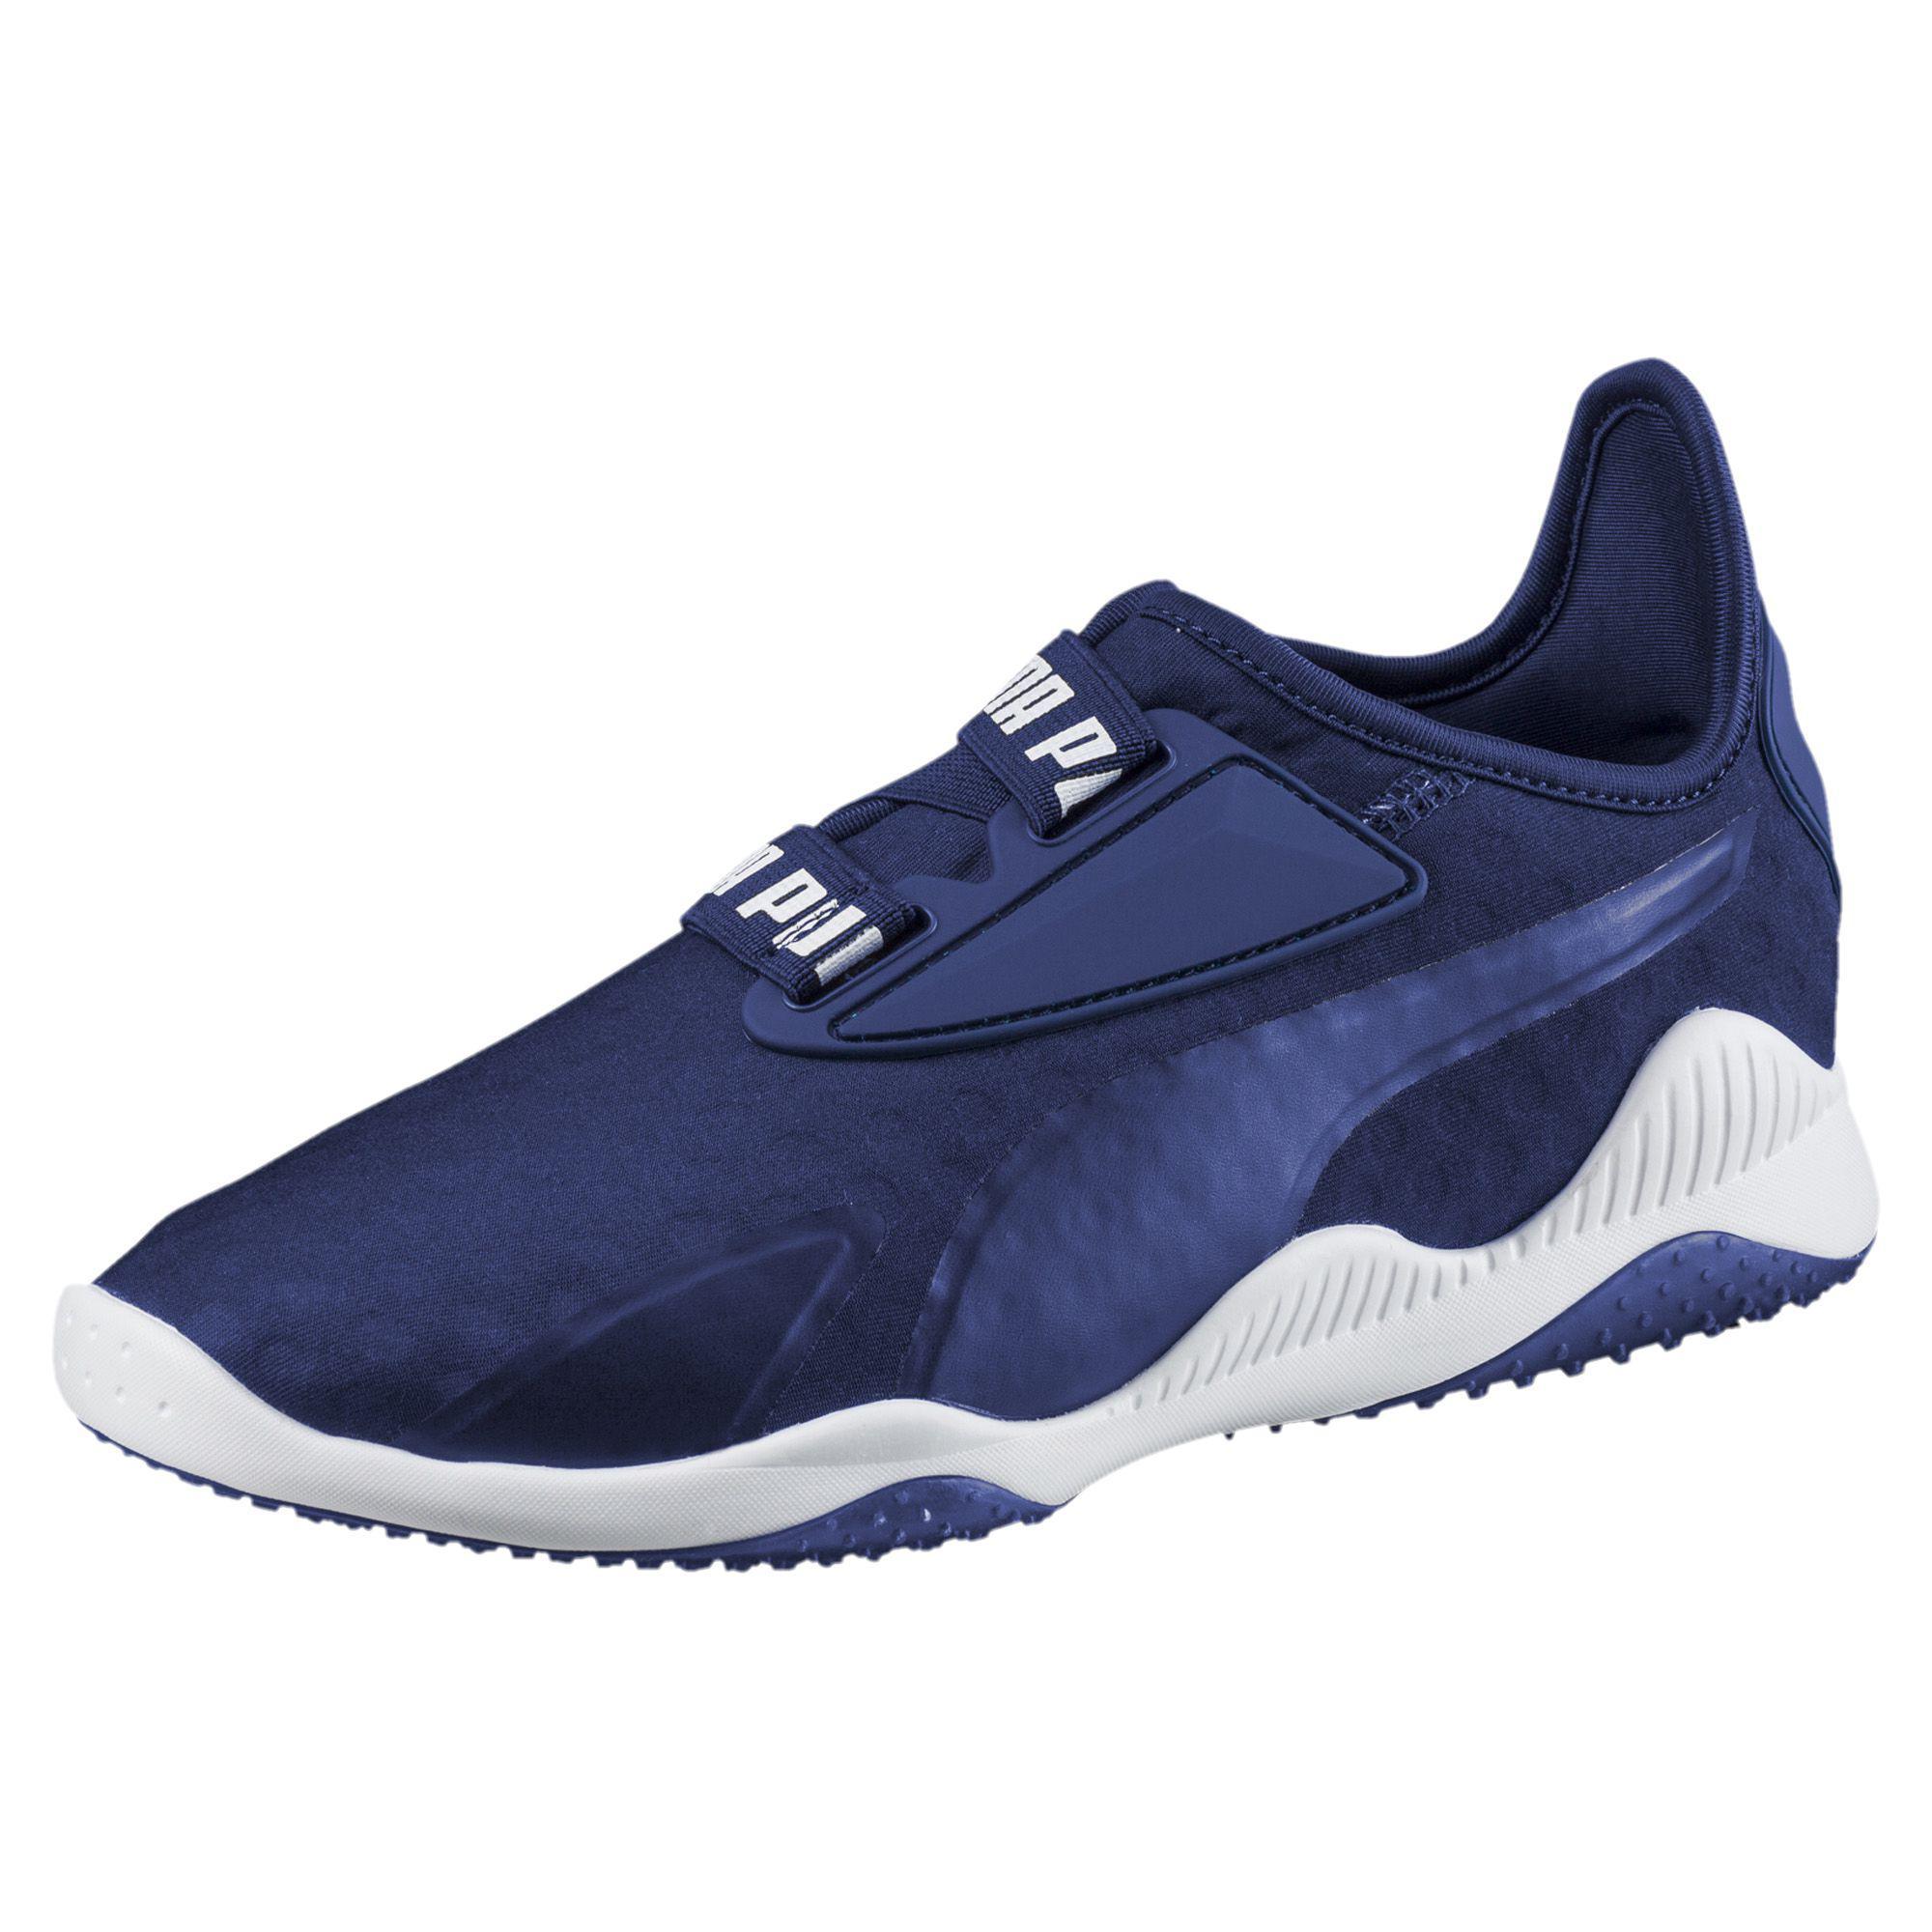 Puma MOSTRO CORE - Trainers - blue rPe4mHP